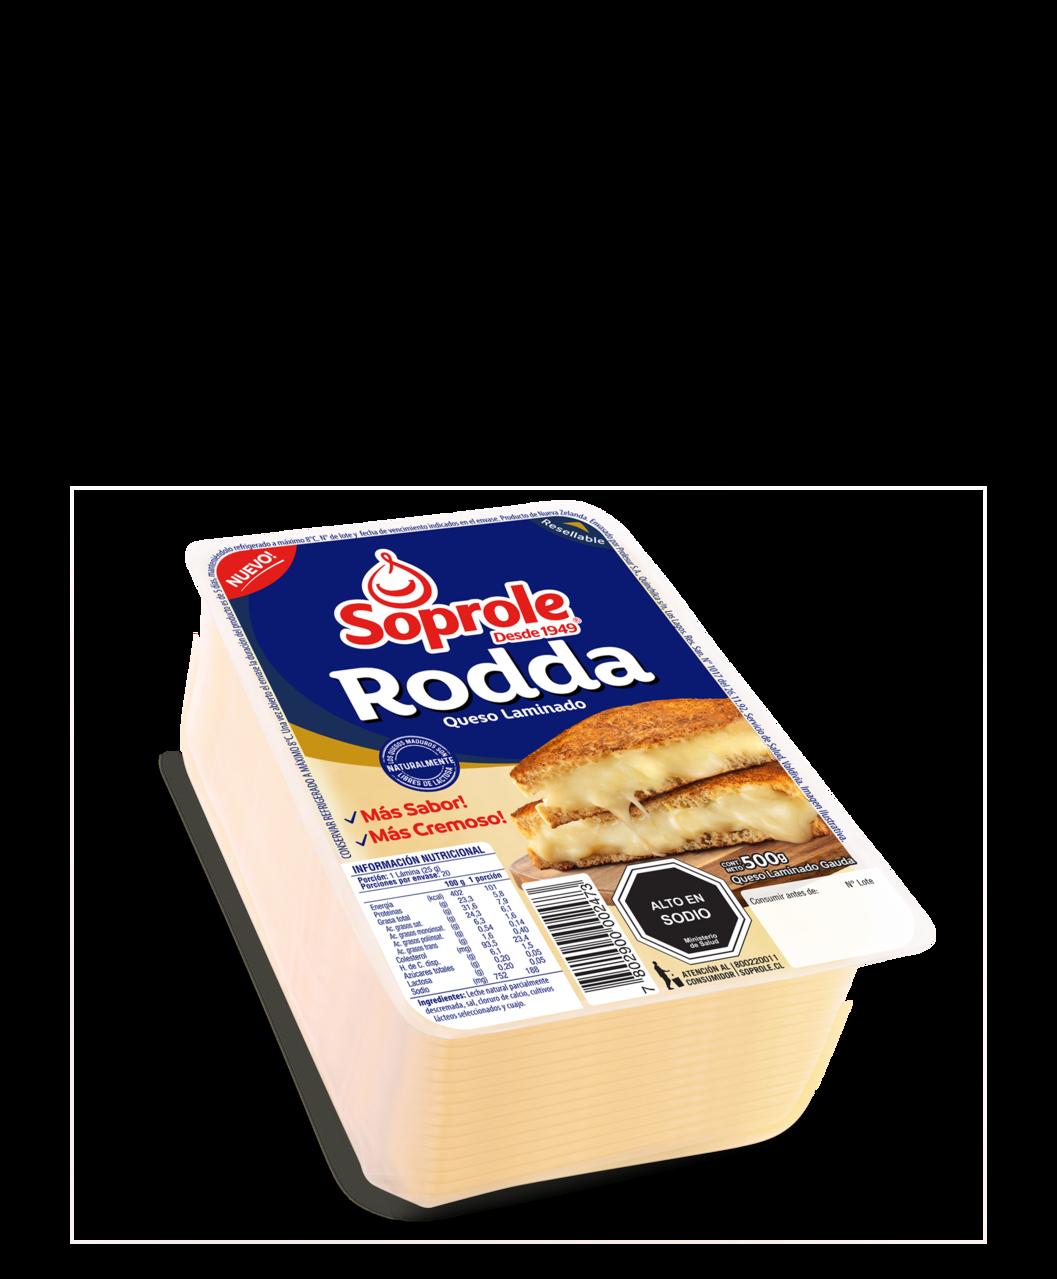 Soprole queso Rodda laminado 500g